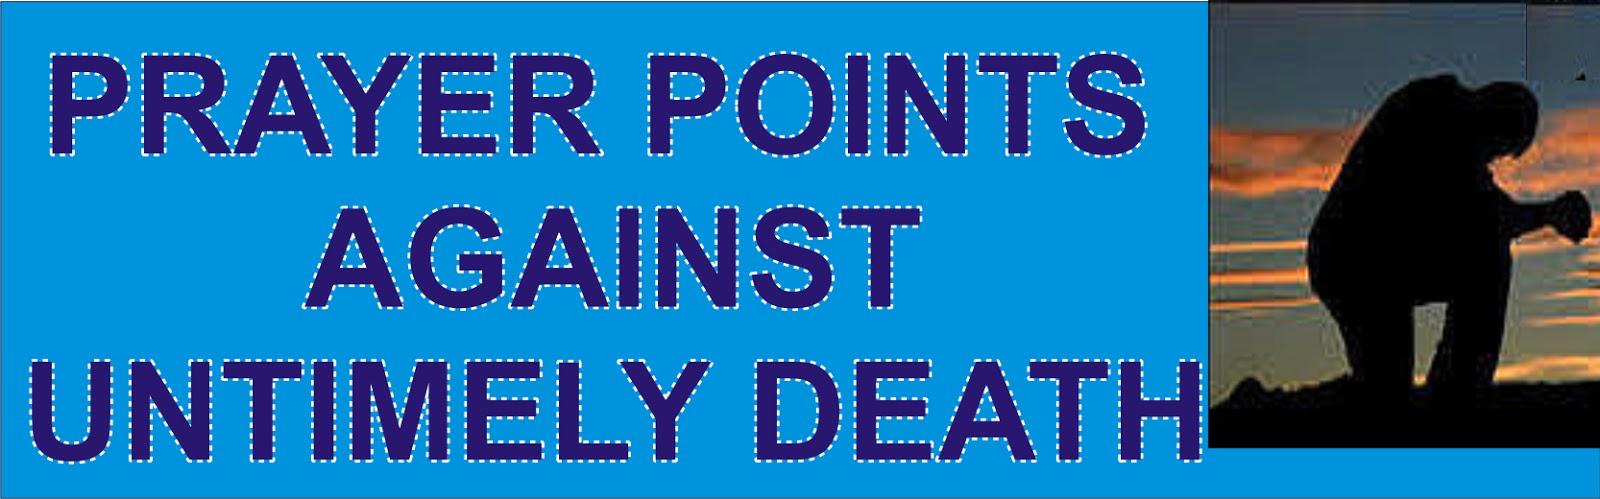 secreteofprayers: PRAYER POINTS AGAINST UNTIMELY DEATH